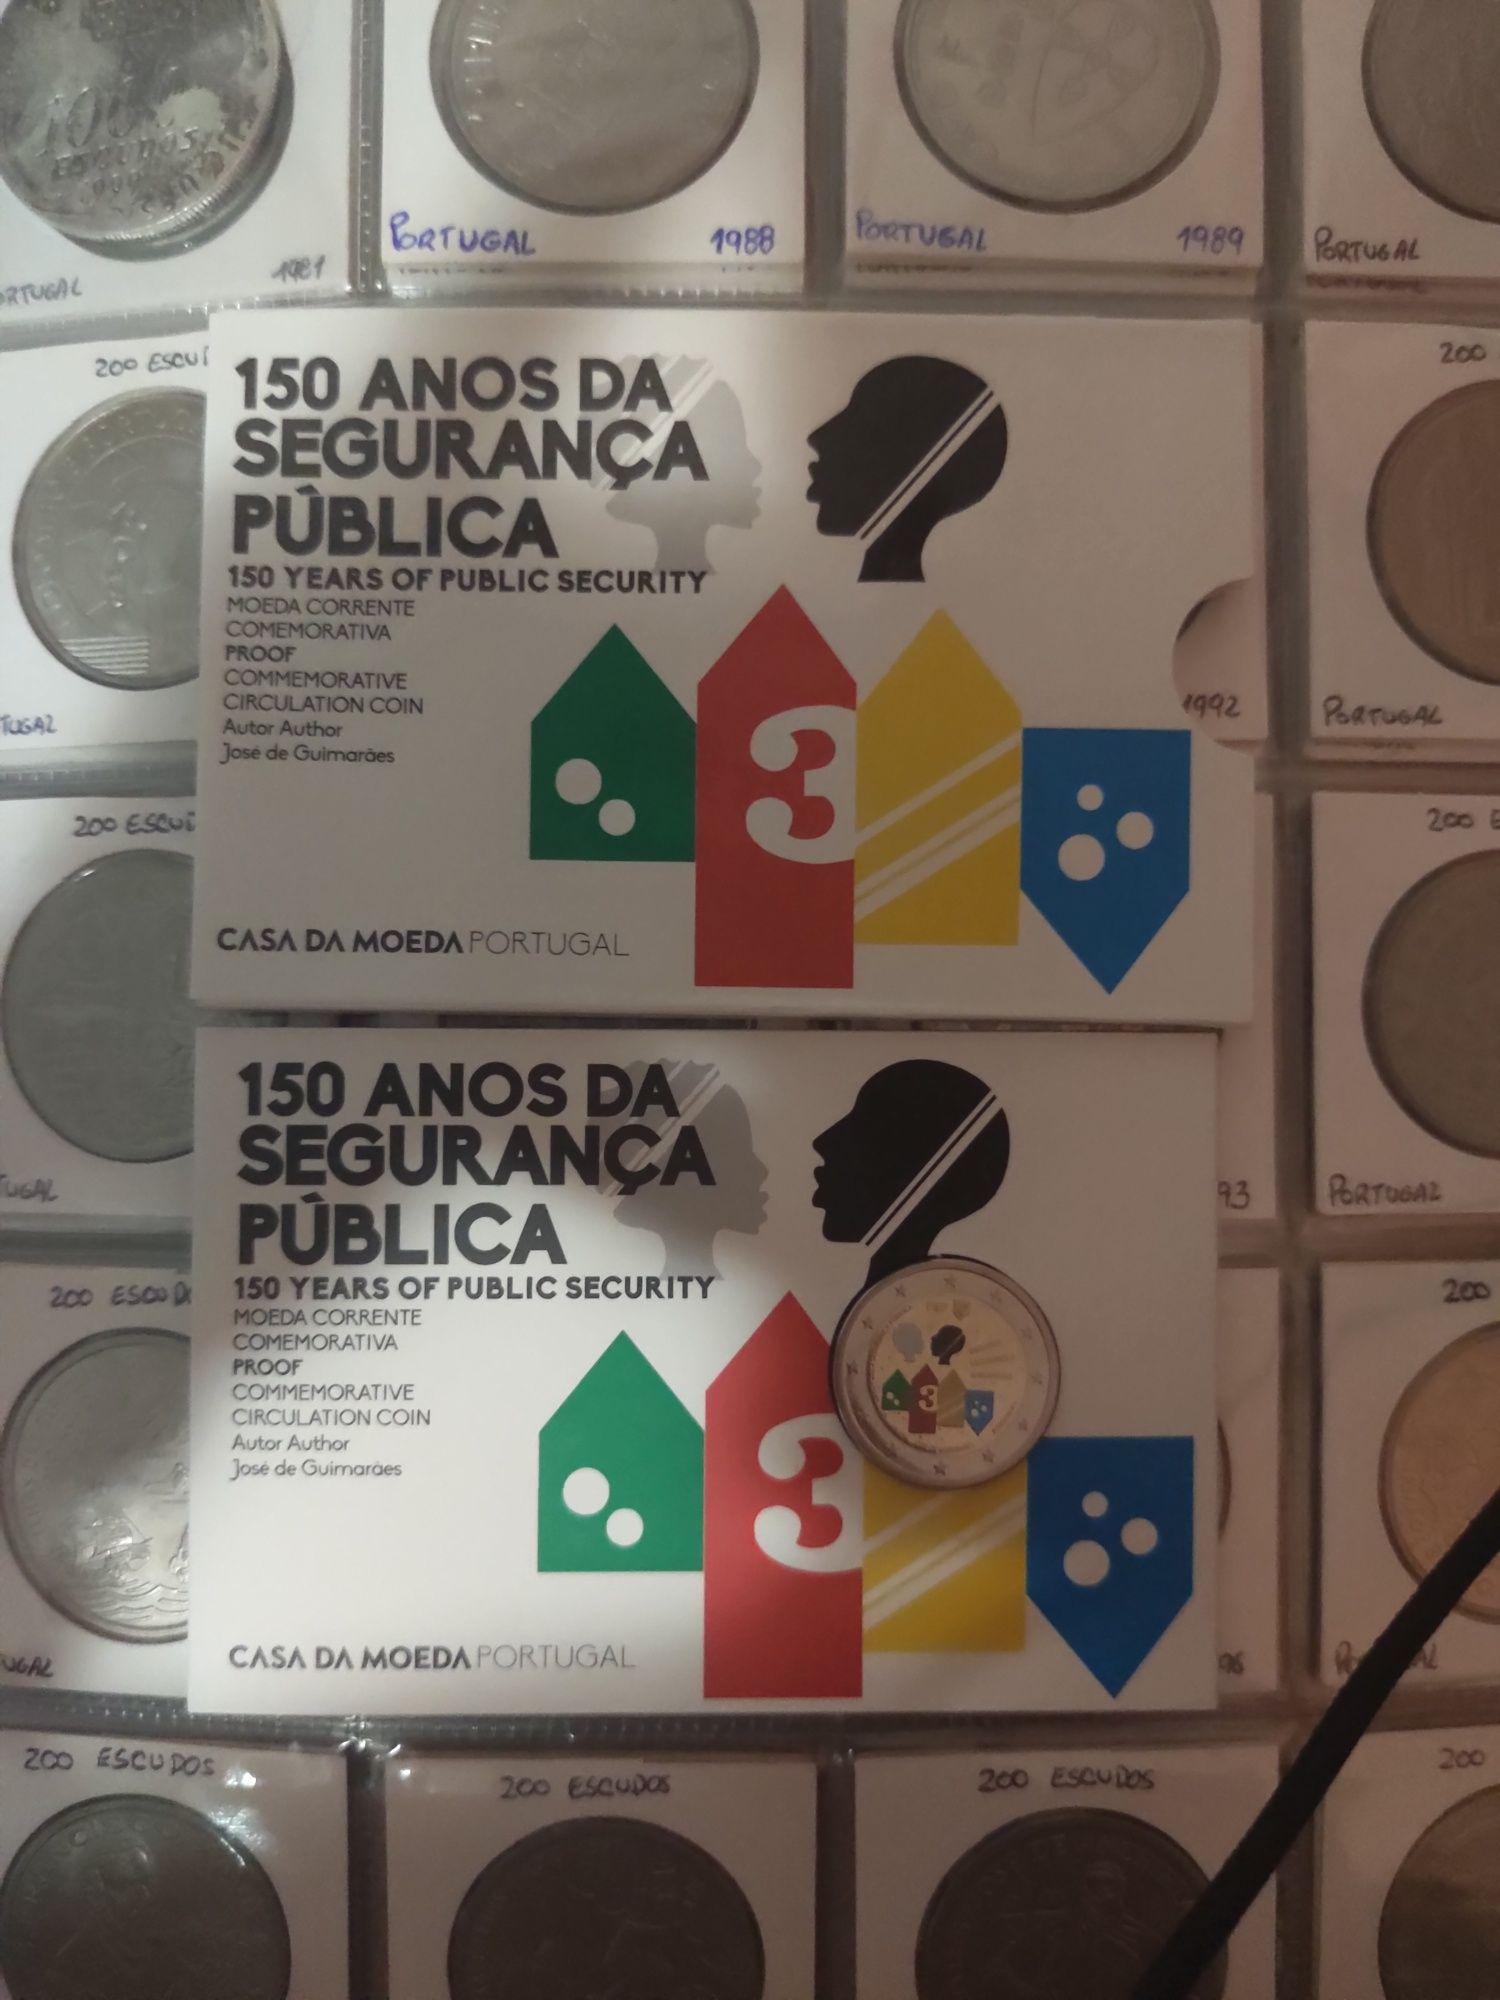 Moeda 2€ - PSP Proof